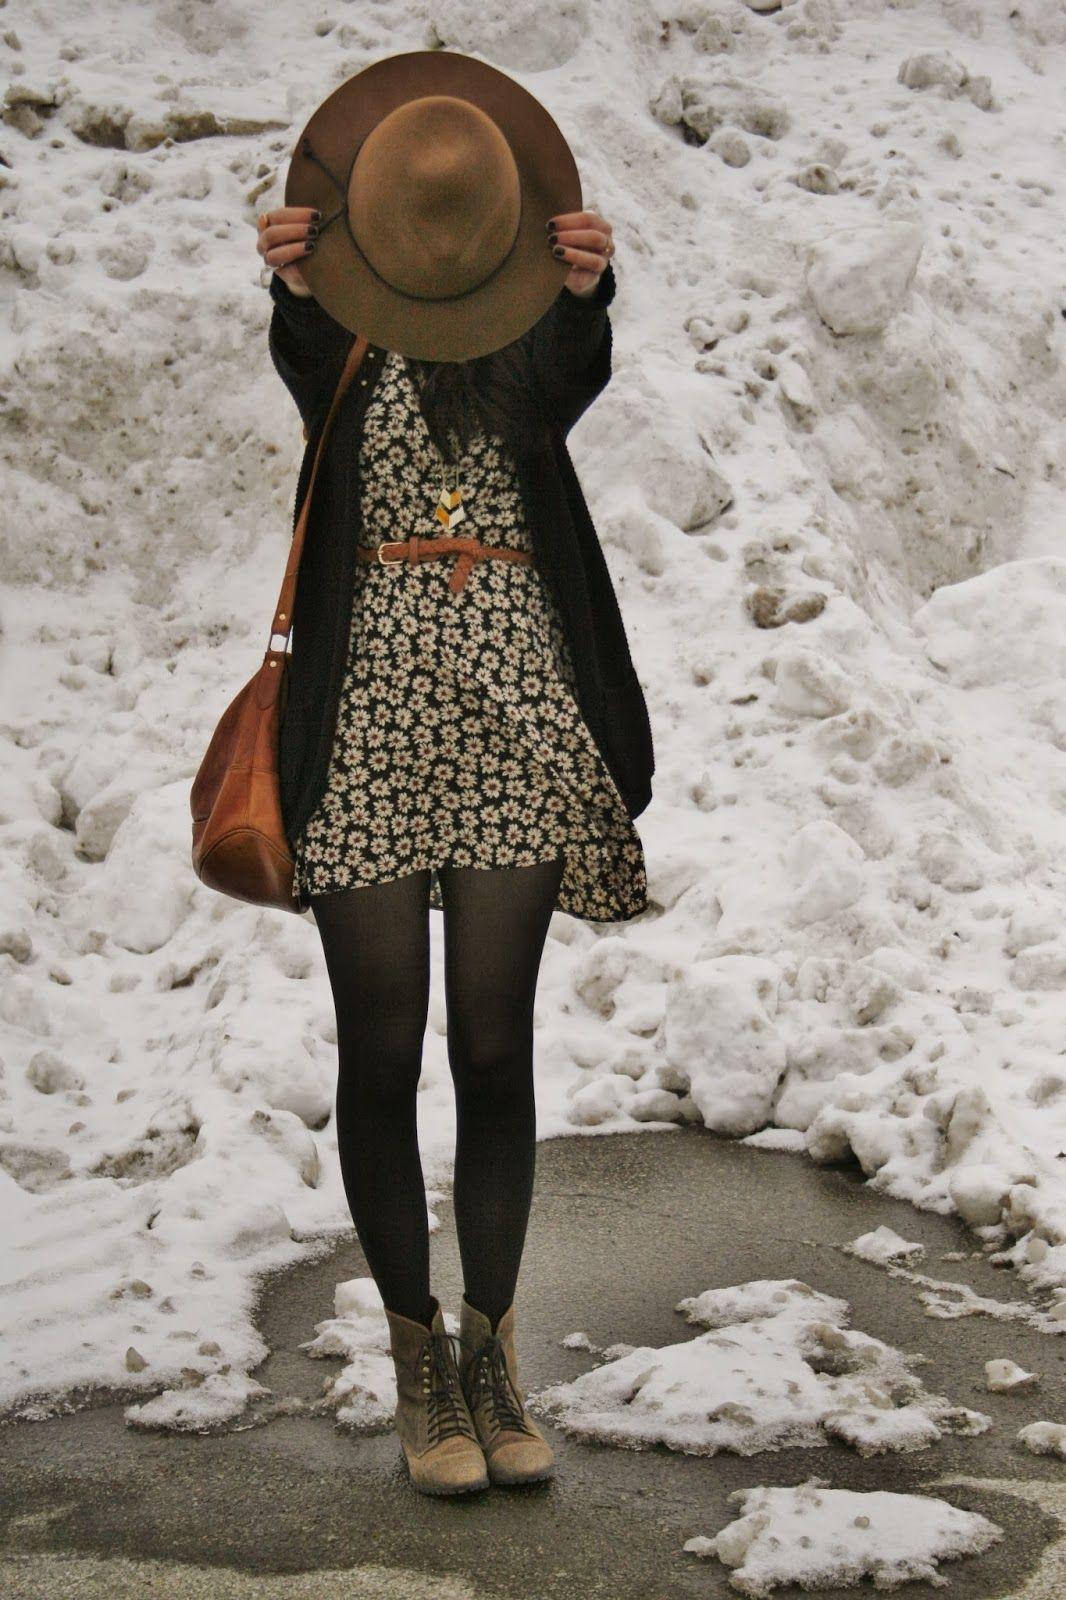 Sombrero. Abrigo negro. Vestido floral. Medias panty.  2c316e482d53